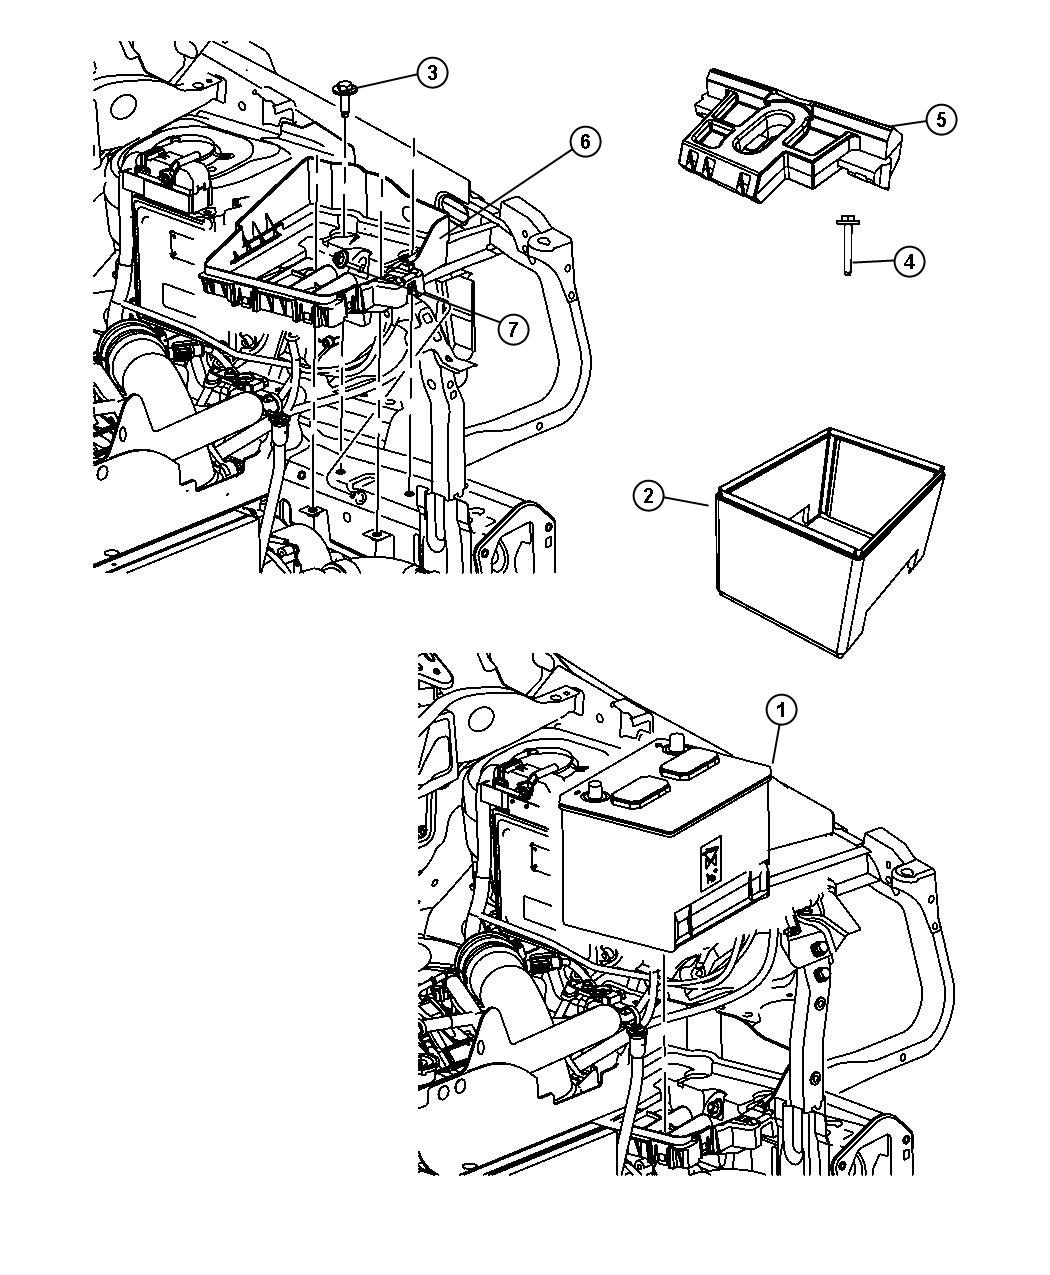 Cj2a Fuel Gauge Wiring Diagram - Wiring Diagrams Jeep Fuel Gauge Wiring Diagram on